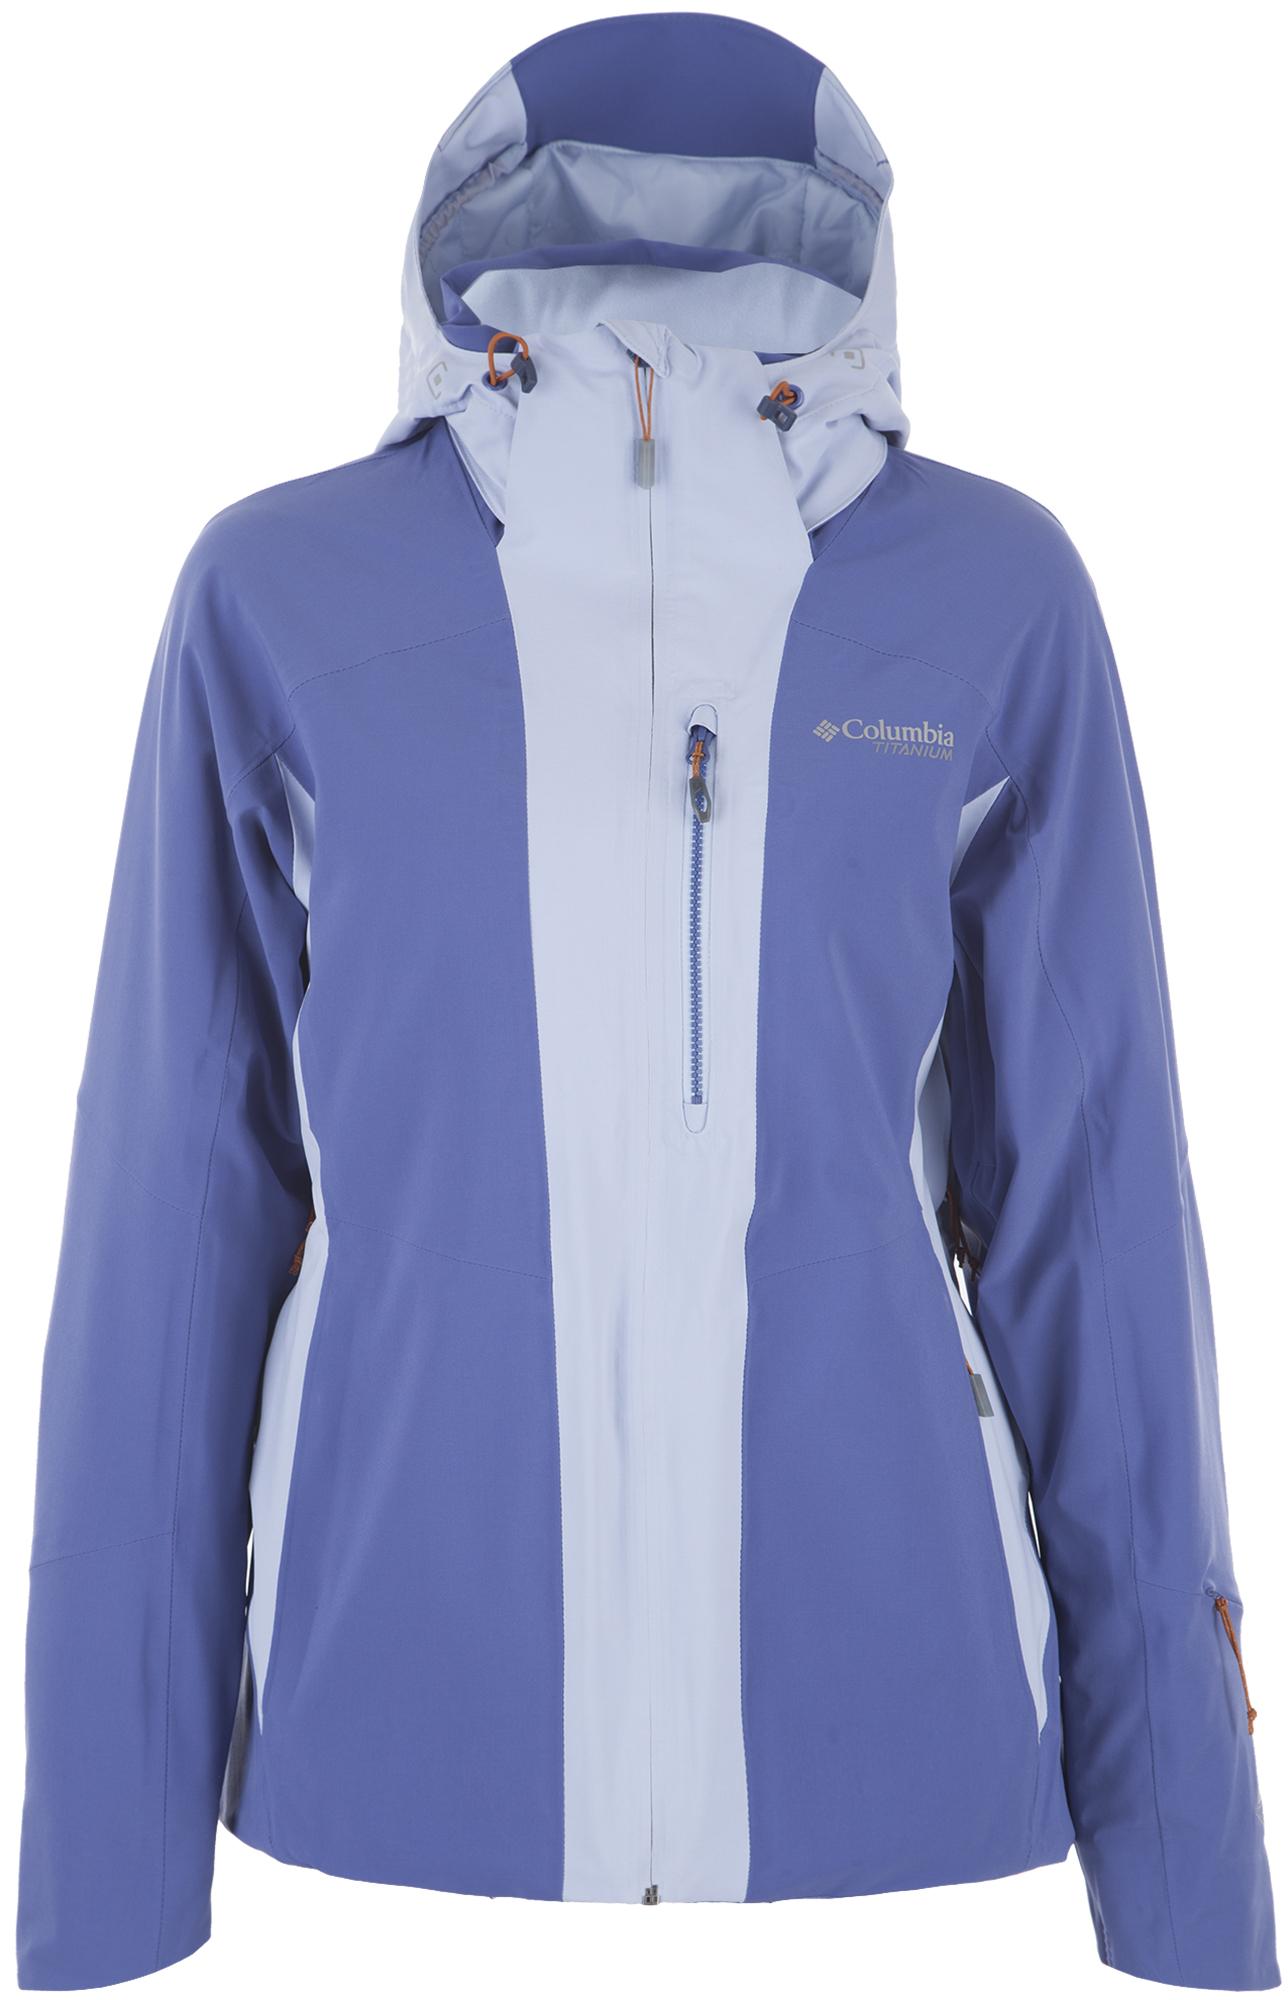 Columbia Куртка утепленная женская Columbia Snow Rival, размер 46 цена и фото